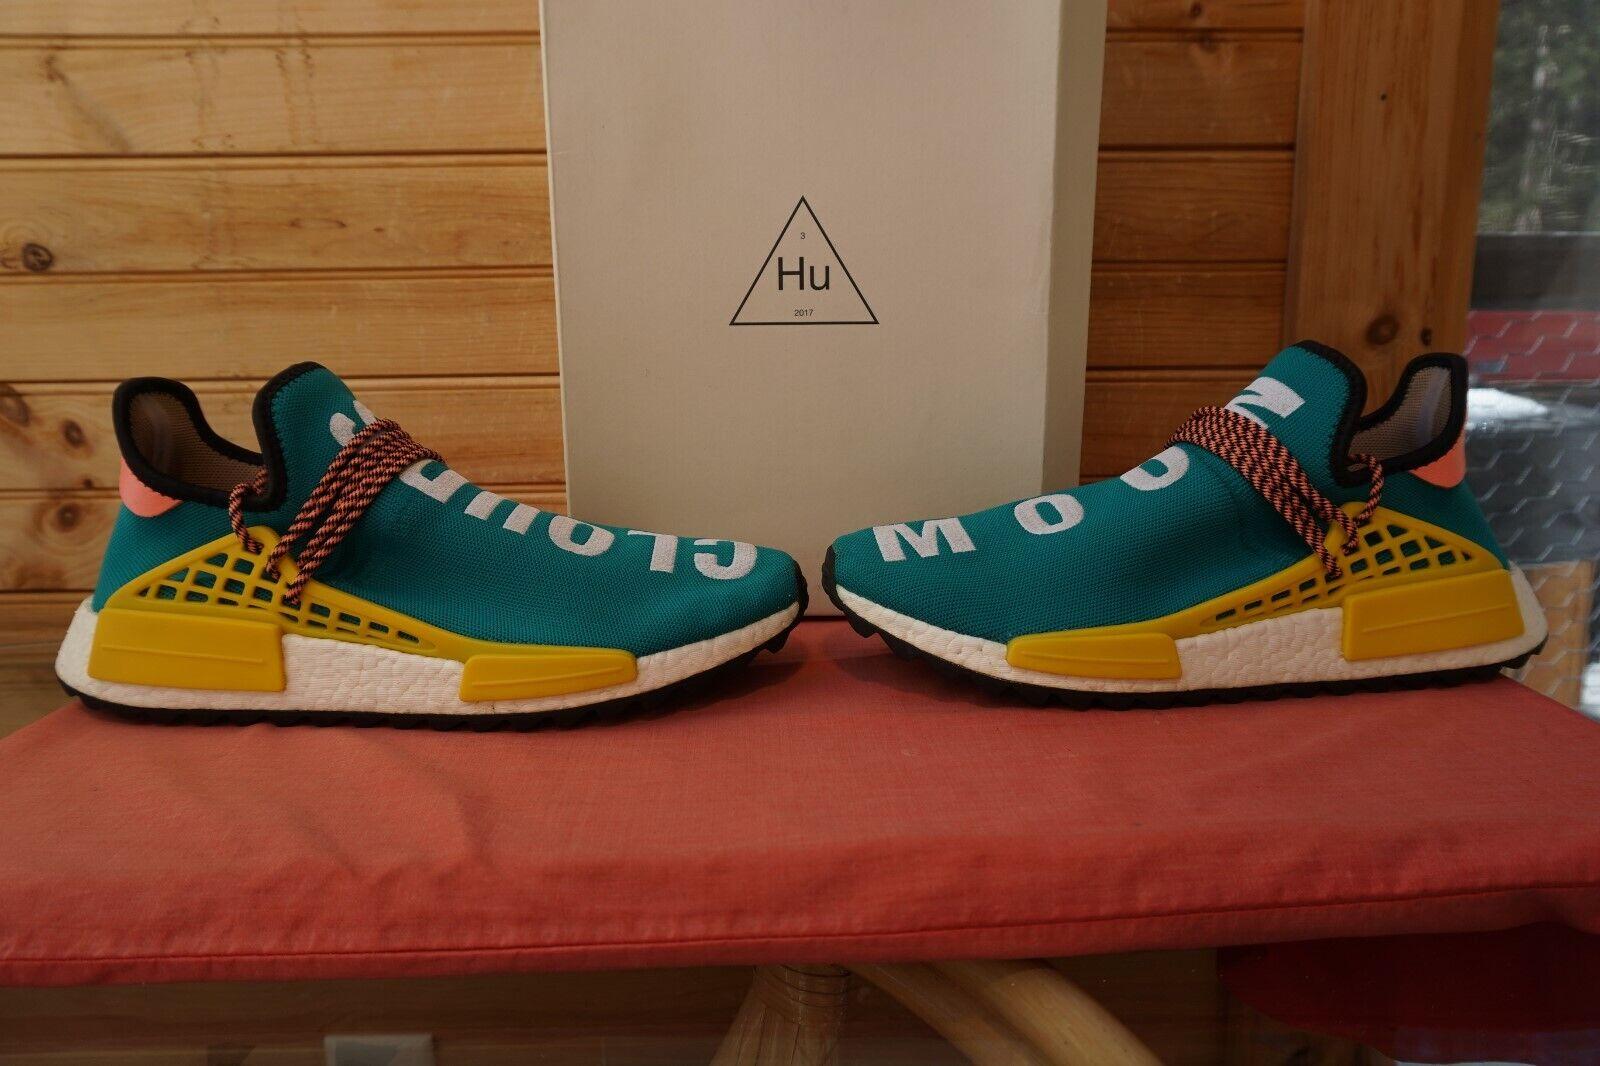 2017 Adidas PW Human Race NMD TR  Pharrell  Sz 12.5 (1174) AC7188